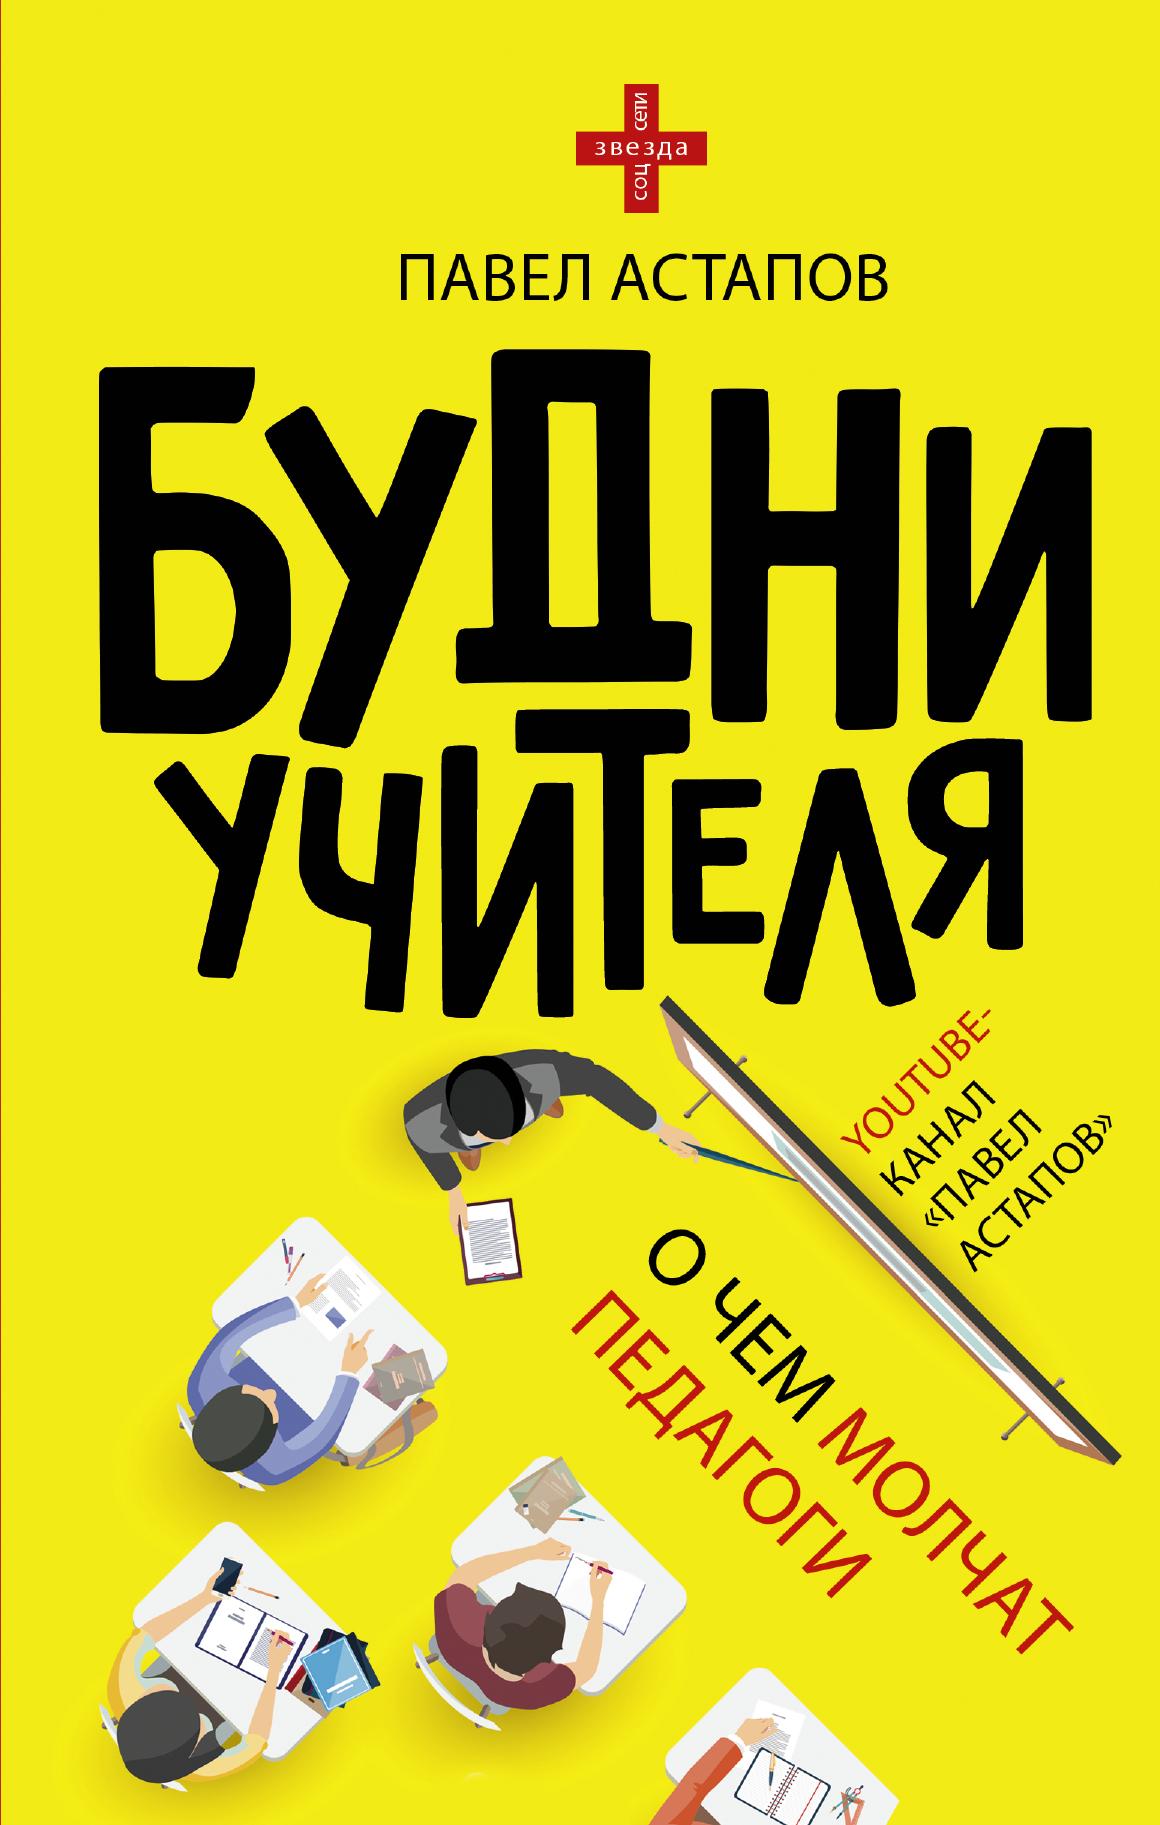 Астапов Павел Викторович Будни учителя